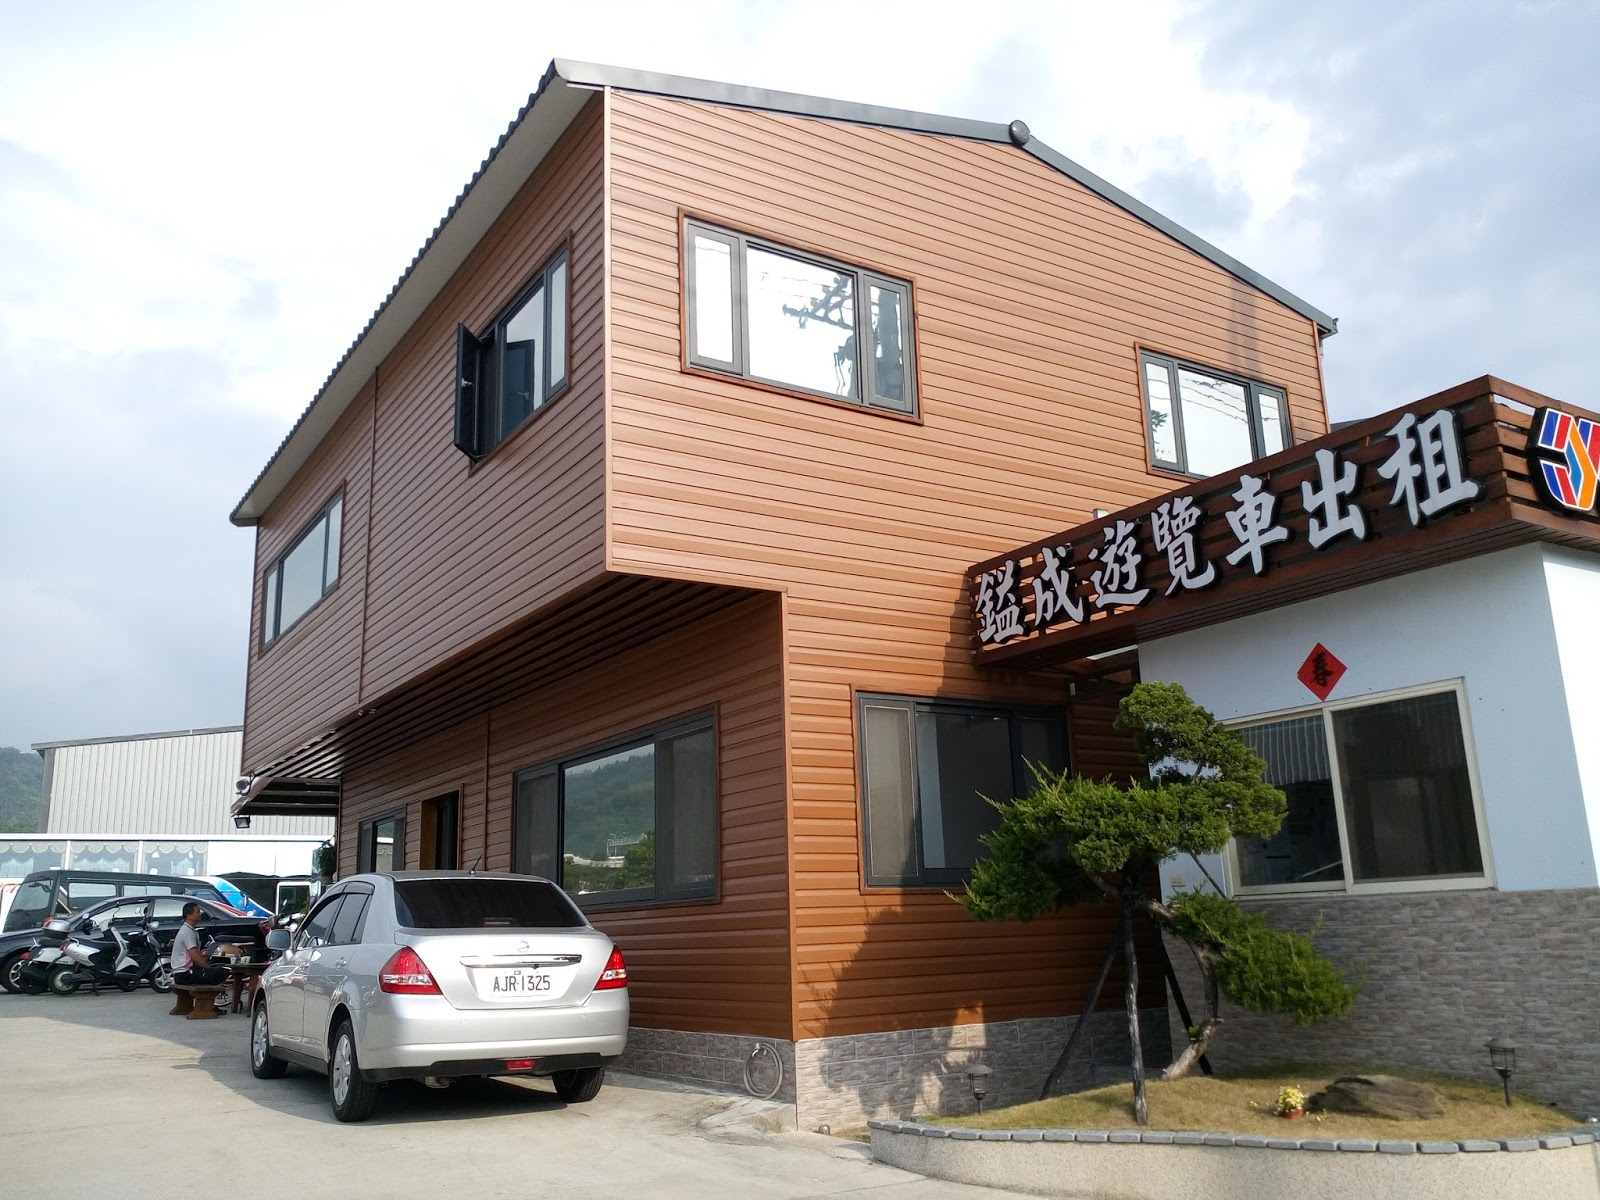 LOFT臺中工業風家具貨櫃屋設計: 小木屋工程設計案例